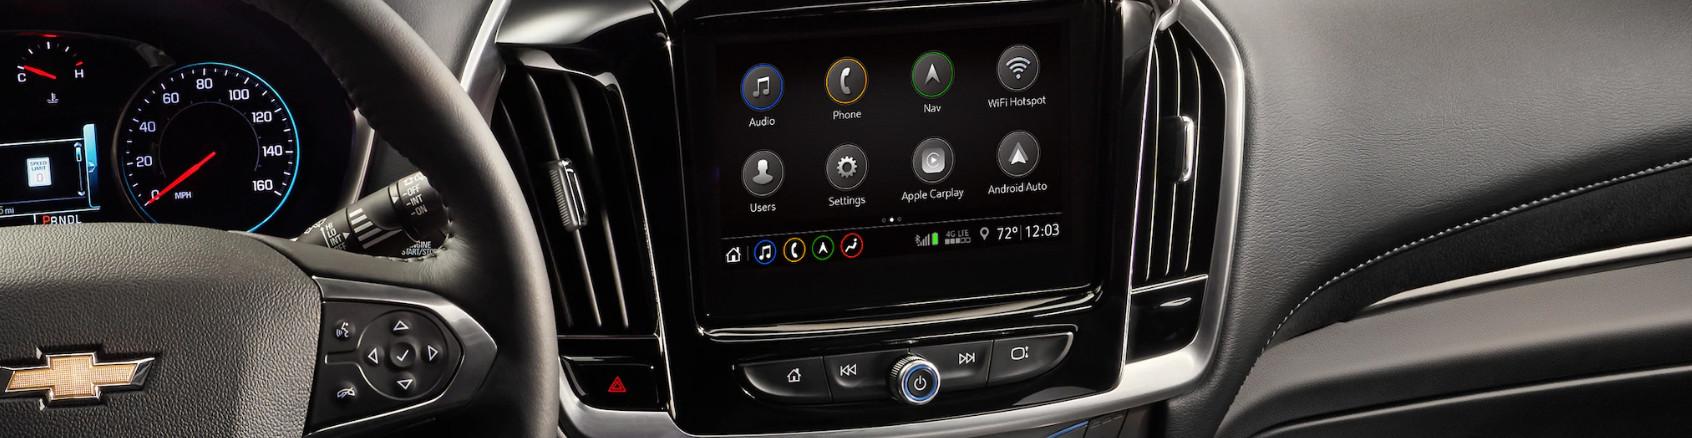 2020 Chevrolet Traverse Technology